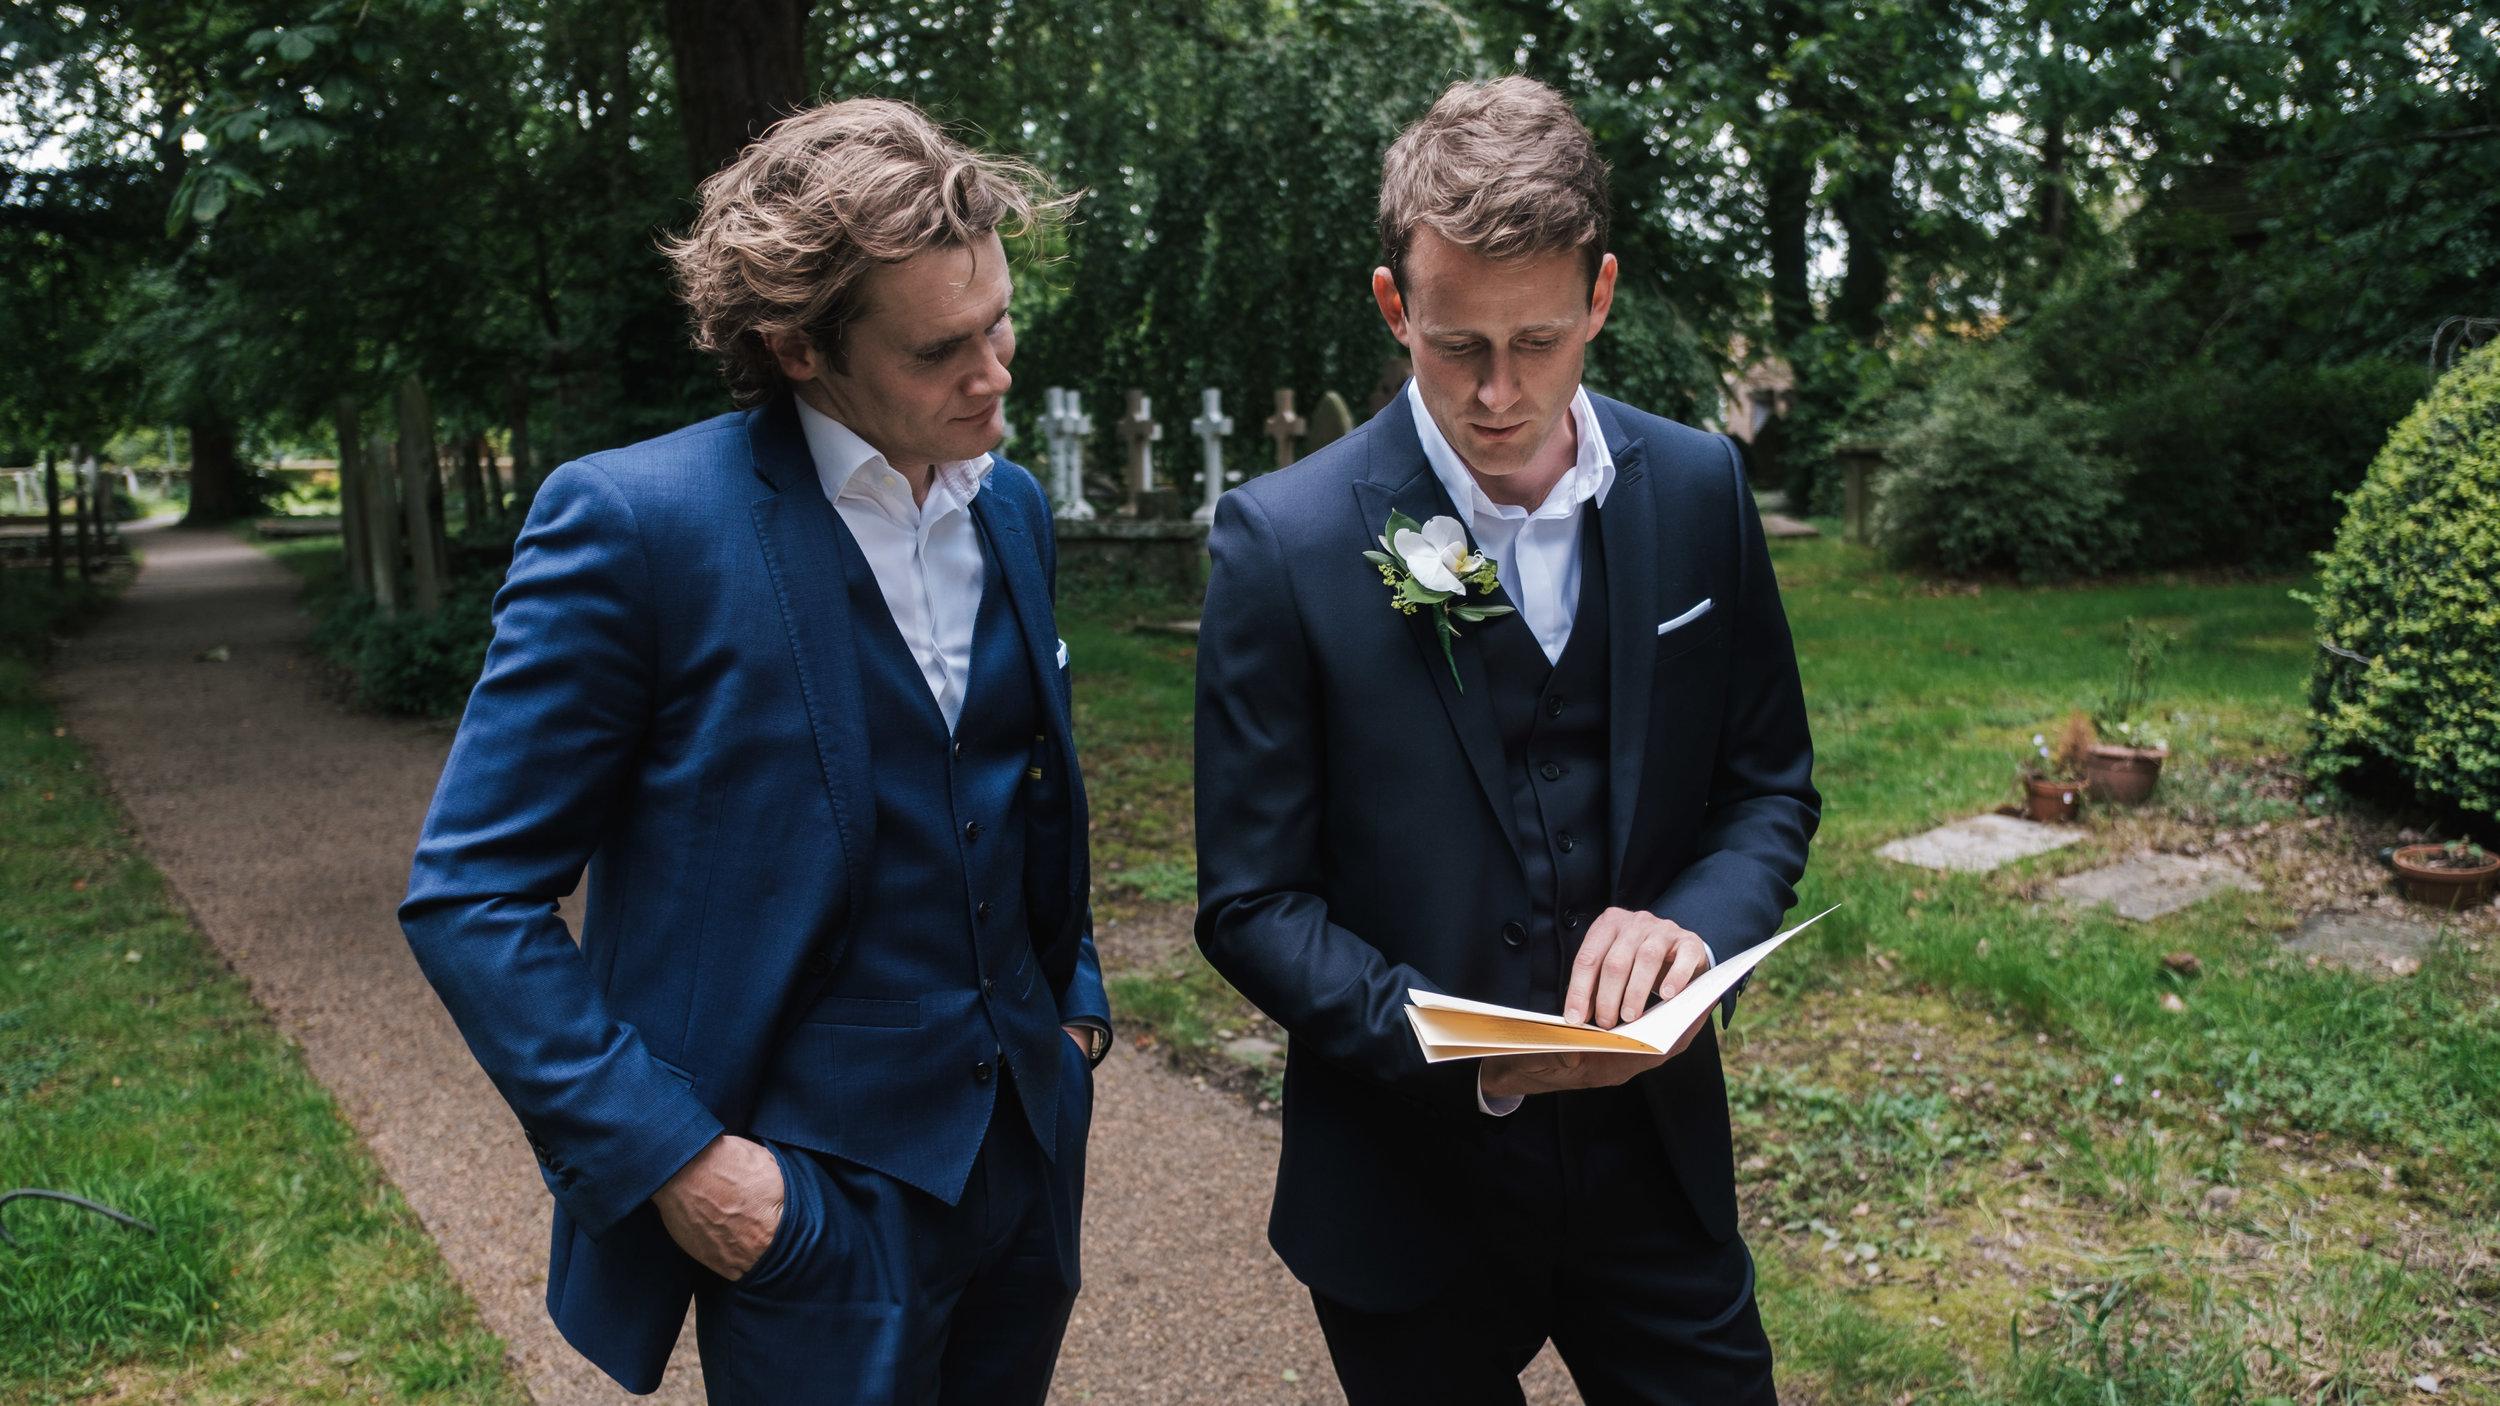 prestbury-cheshire-wedding-photographer-0002.JPG